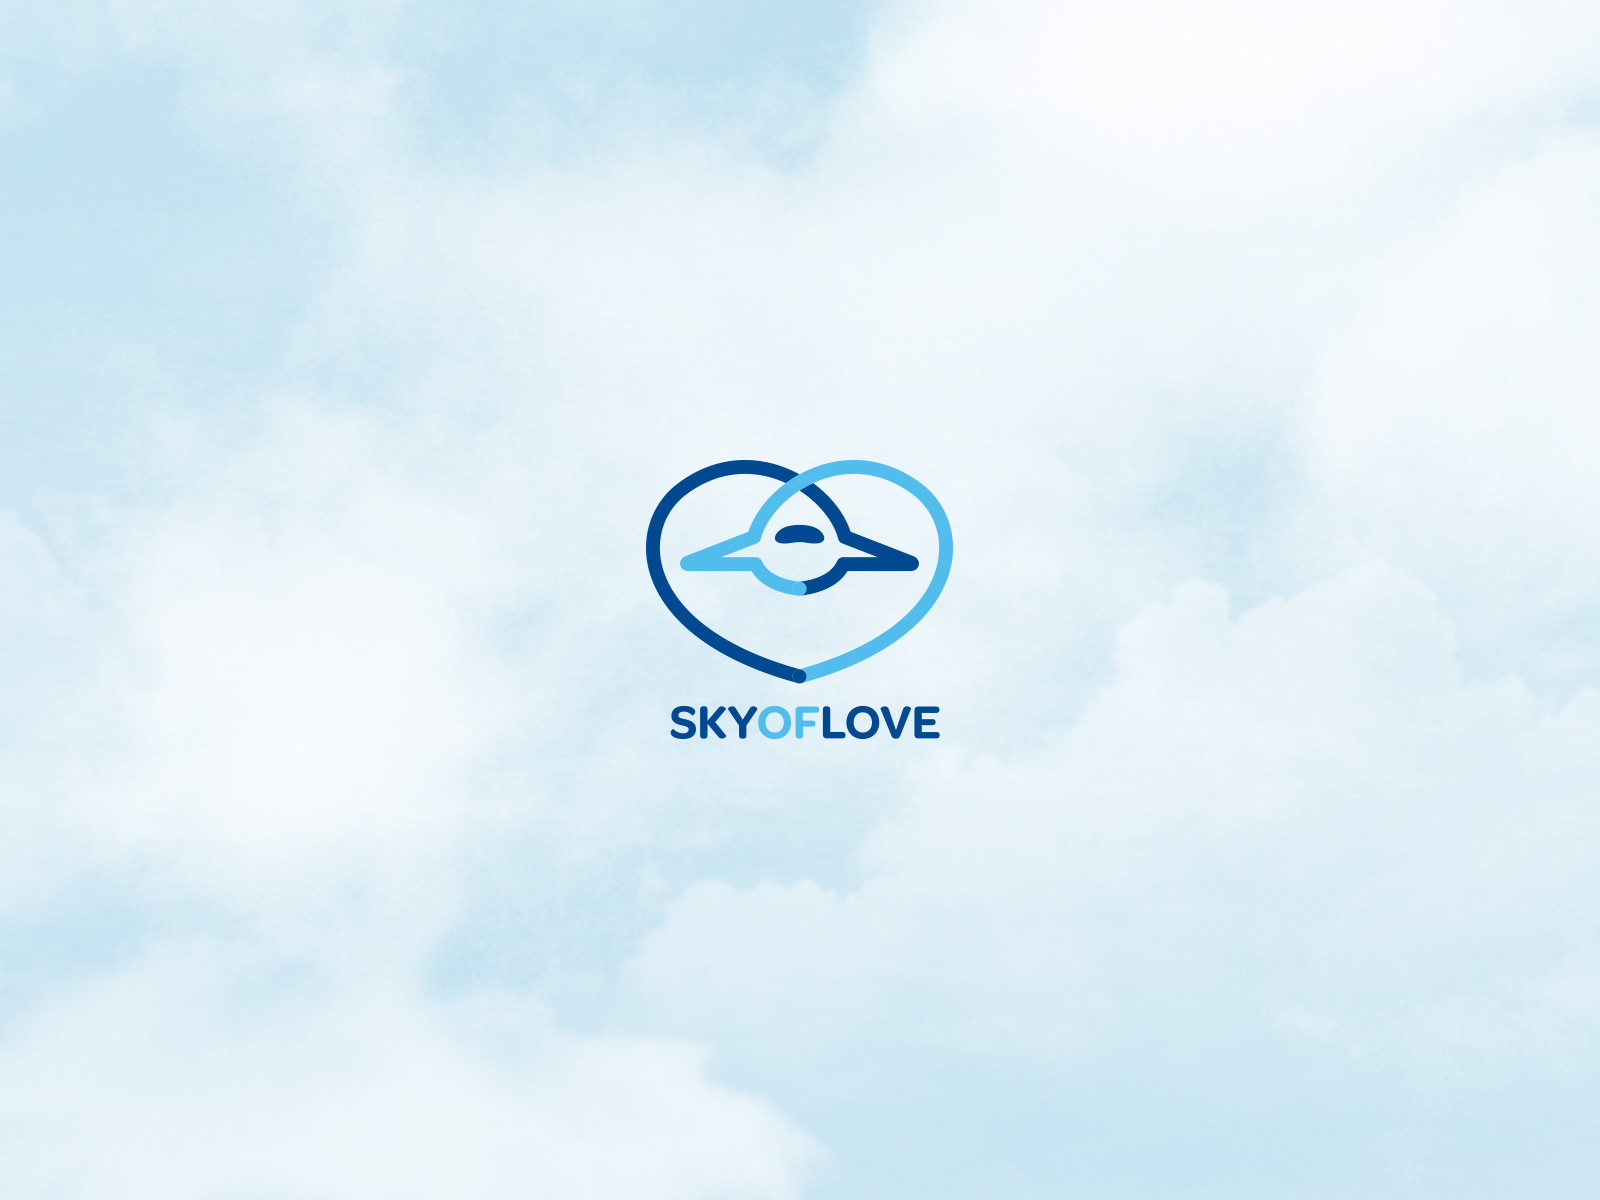 Sky of love 2